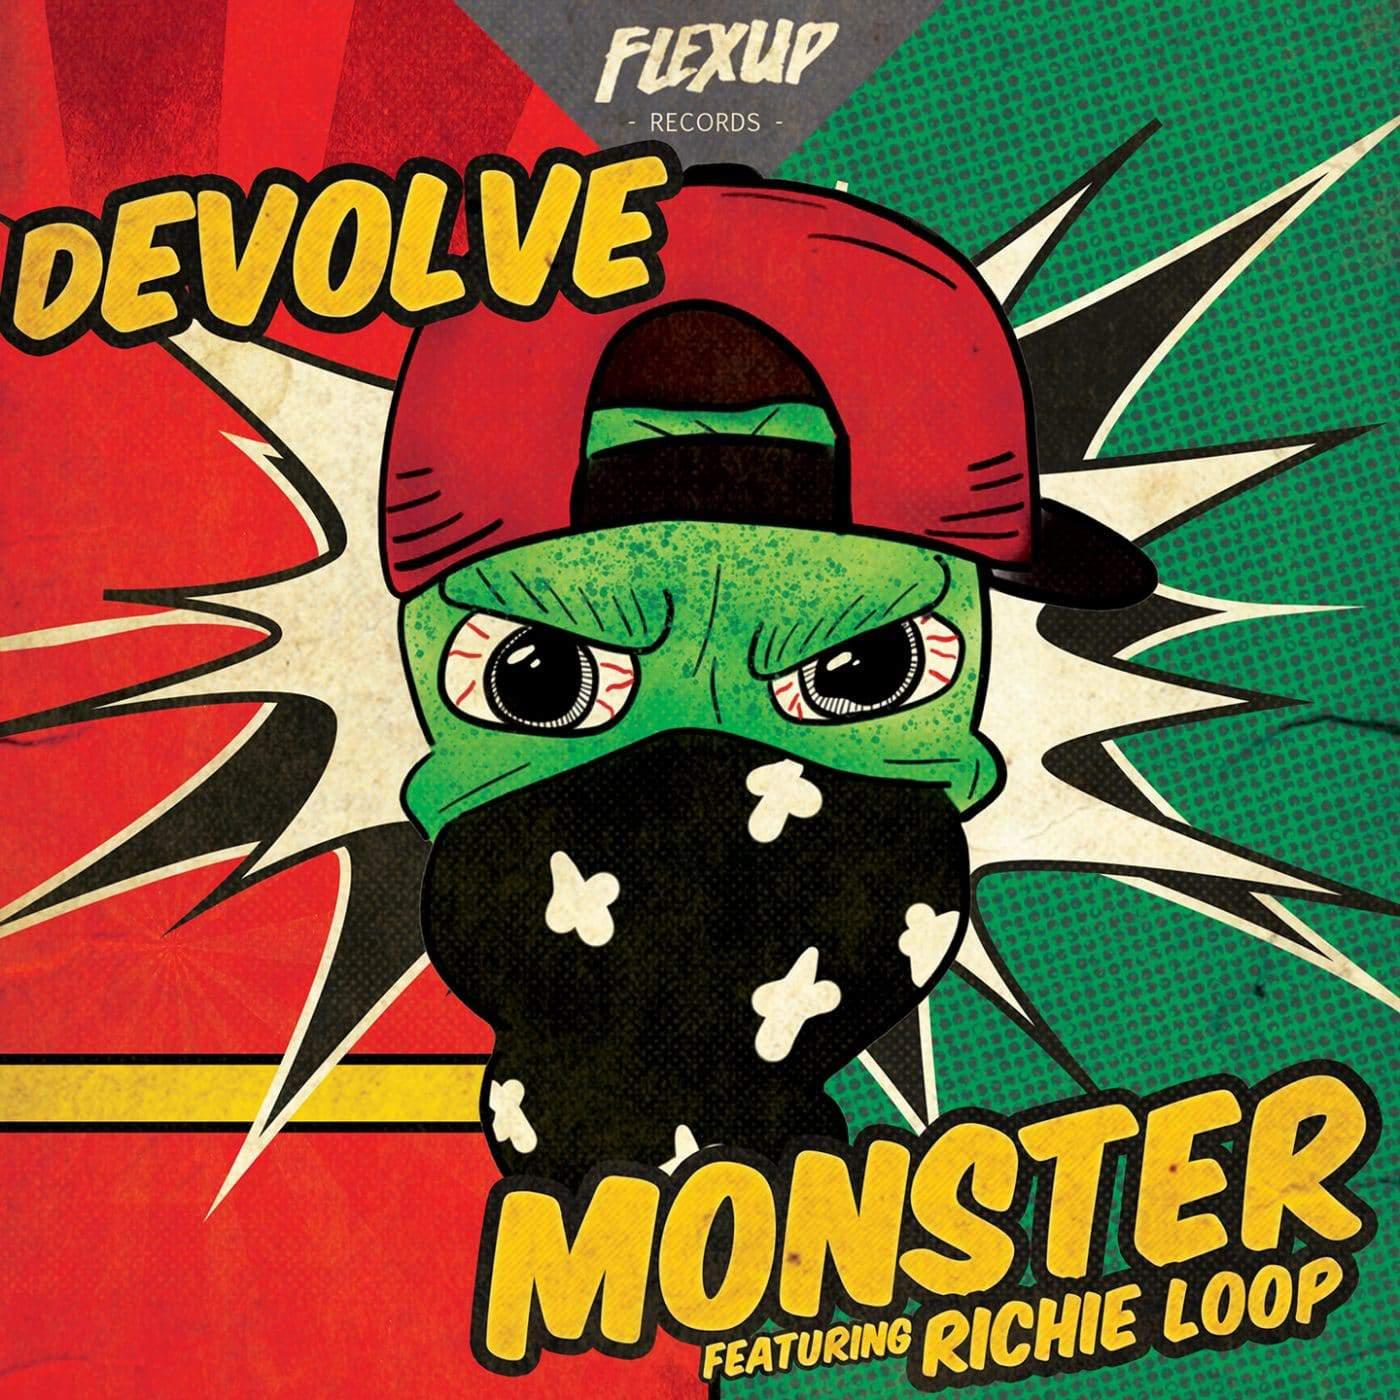 dEVOLVE ft Riche Loop - Monster - Flex Up Records